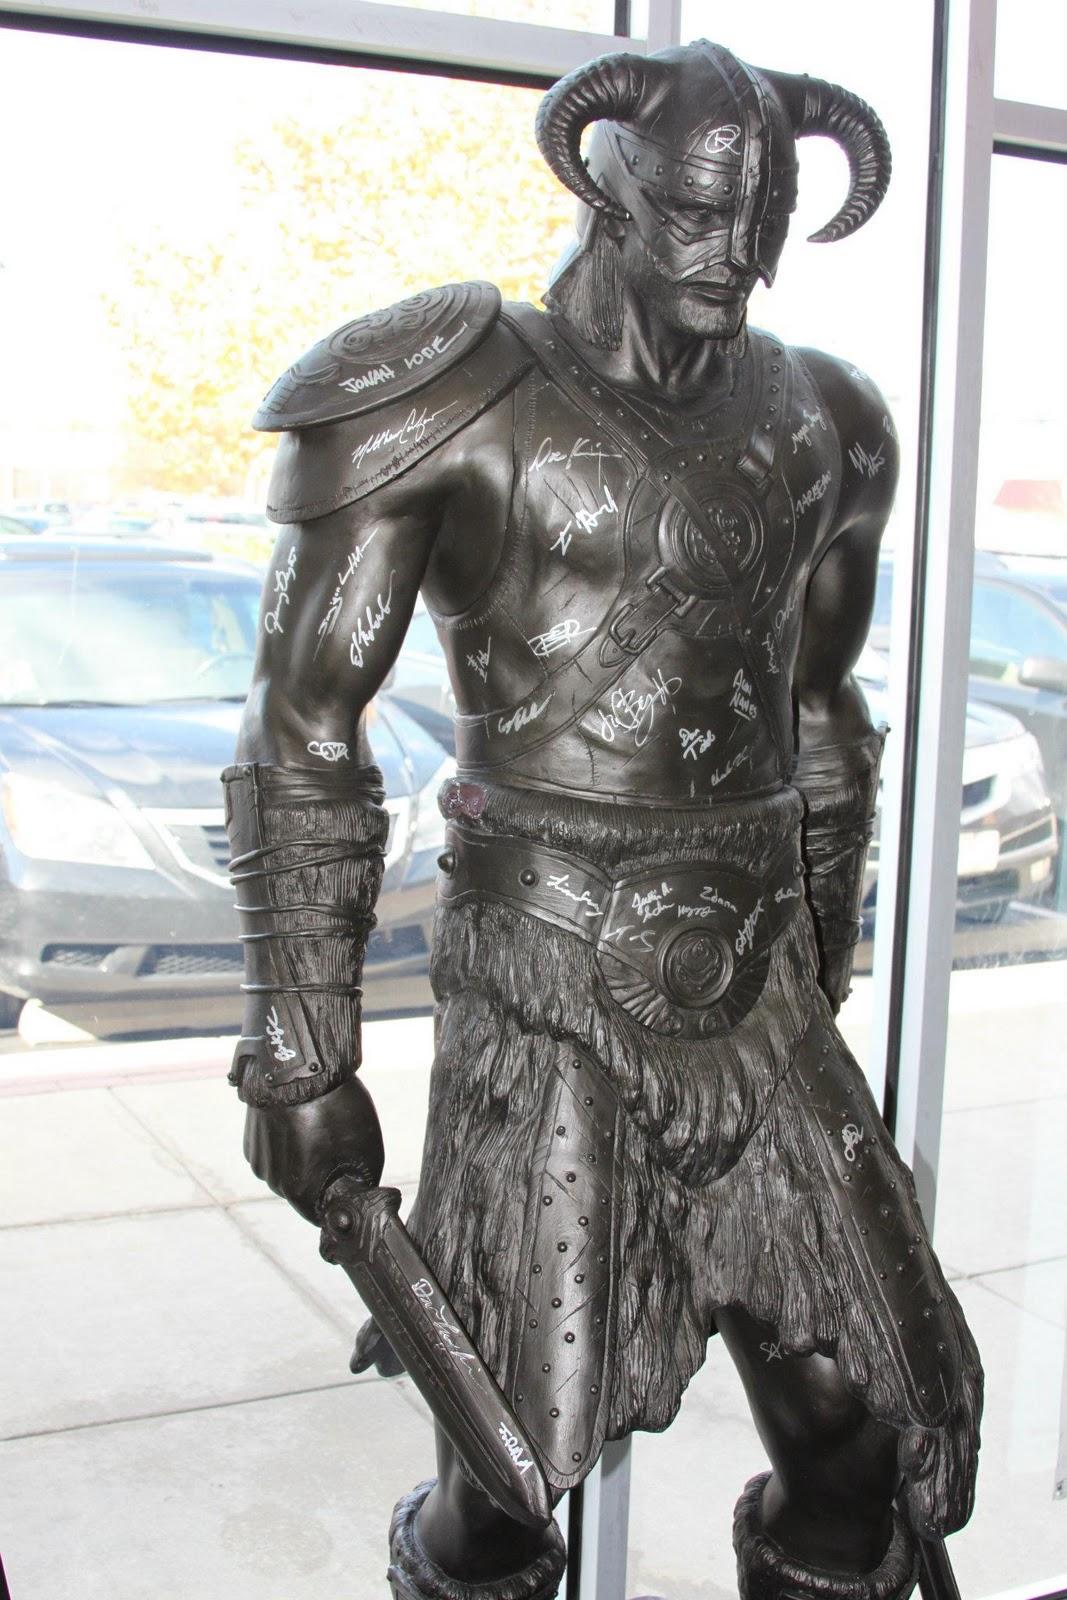 http://4.bp.blogspot.com/-CRmID_xbf2A/TsI3qGKjjBI/AAAAAAAAAhI/WA1ia_w0LxE/s1600/dragonborn-dovahkiin-statue1.jpg